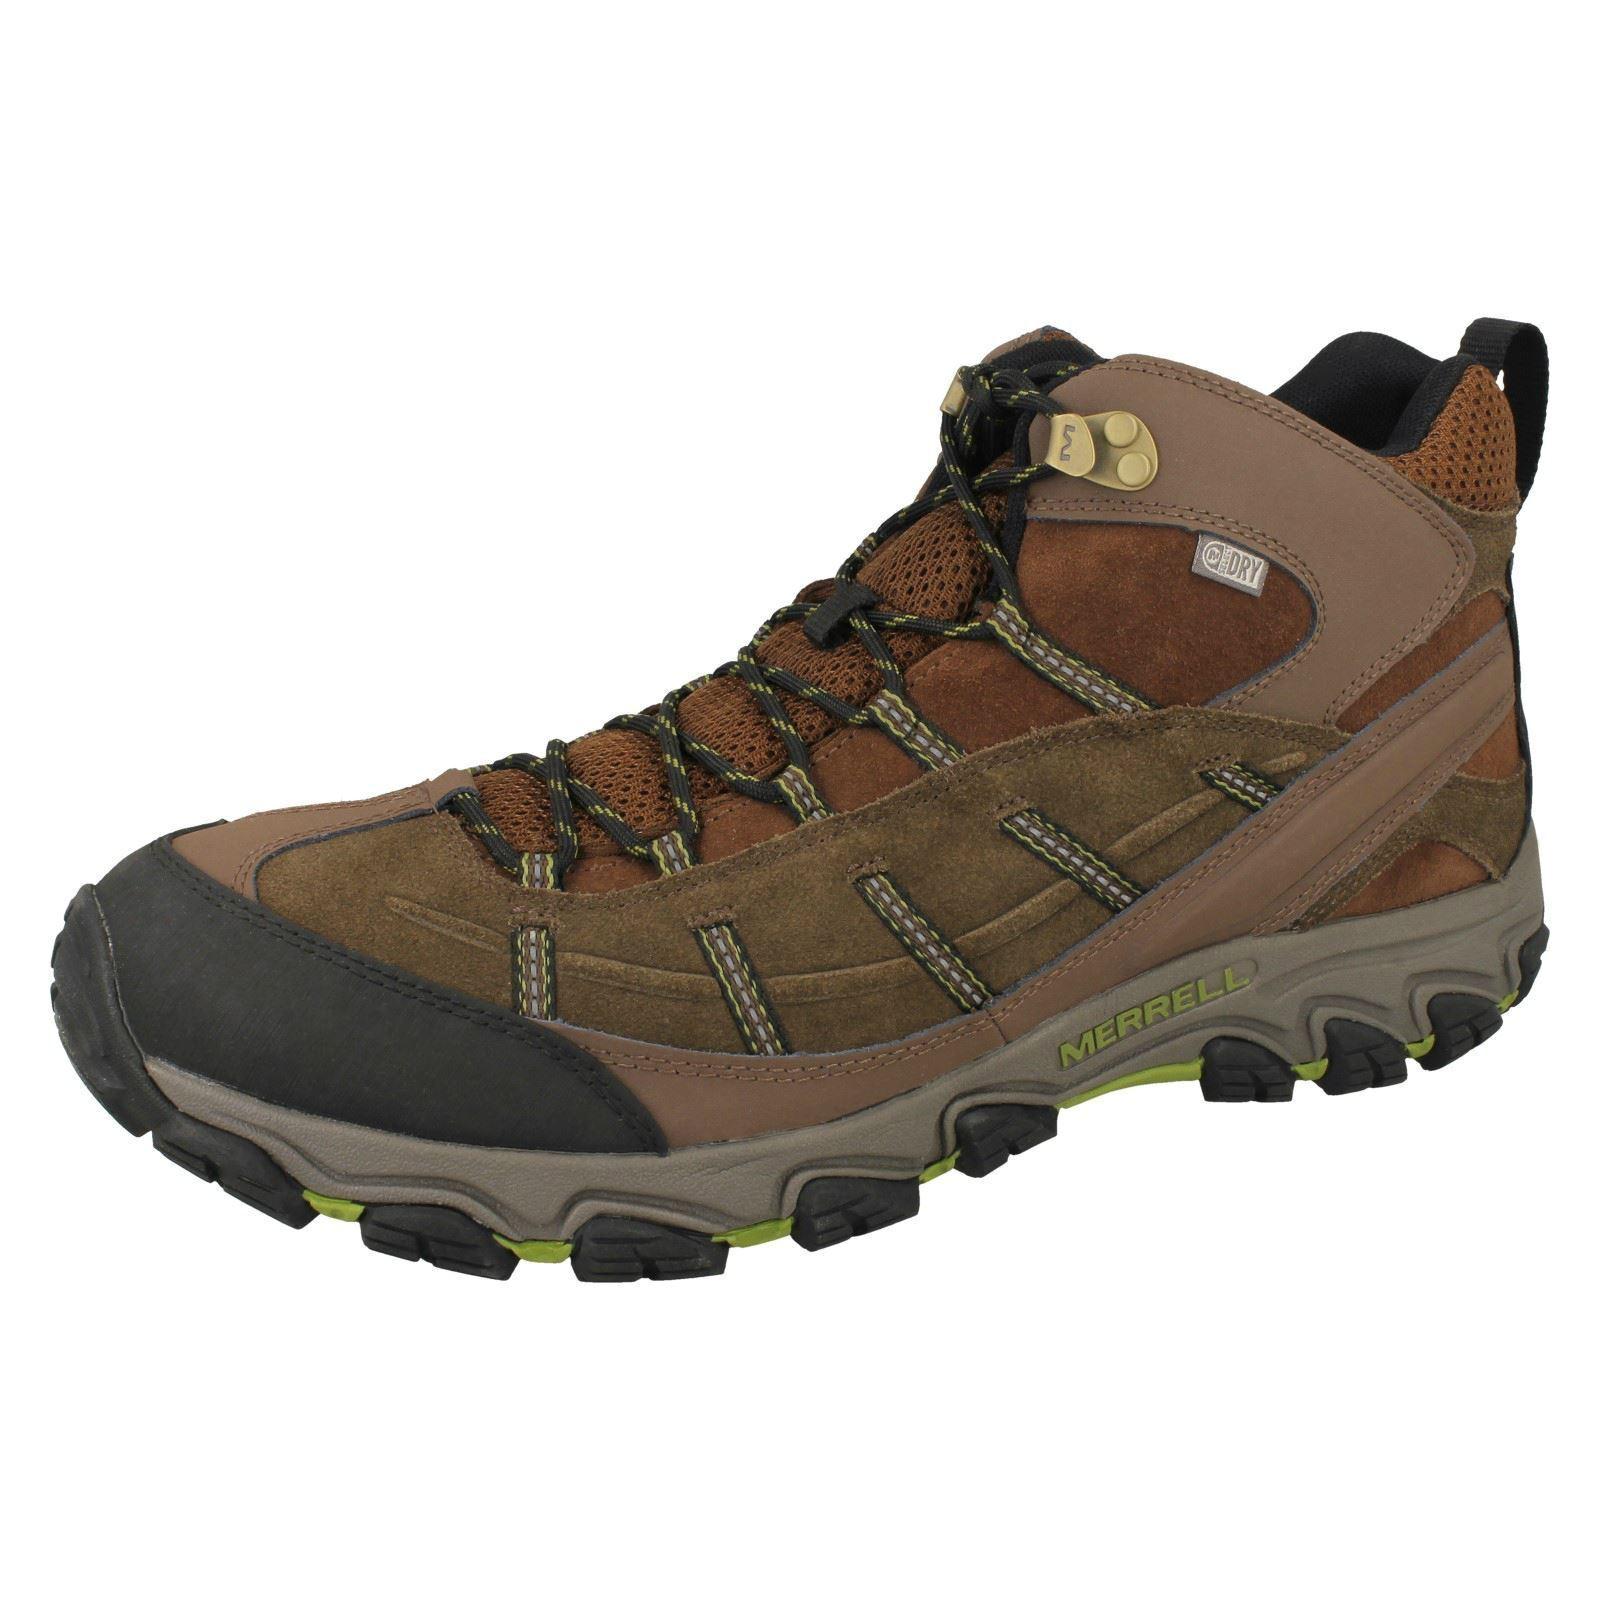 Mens Merrell Waterproof Walking Boots